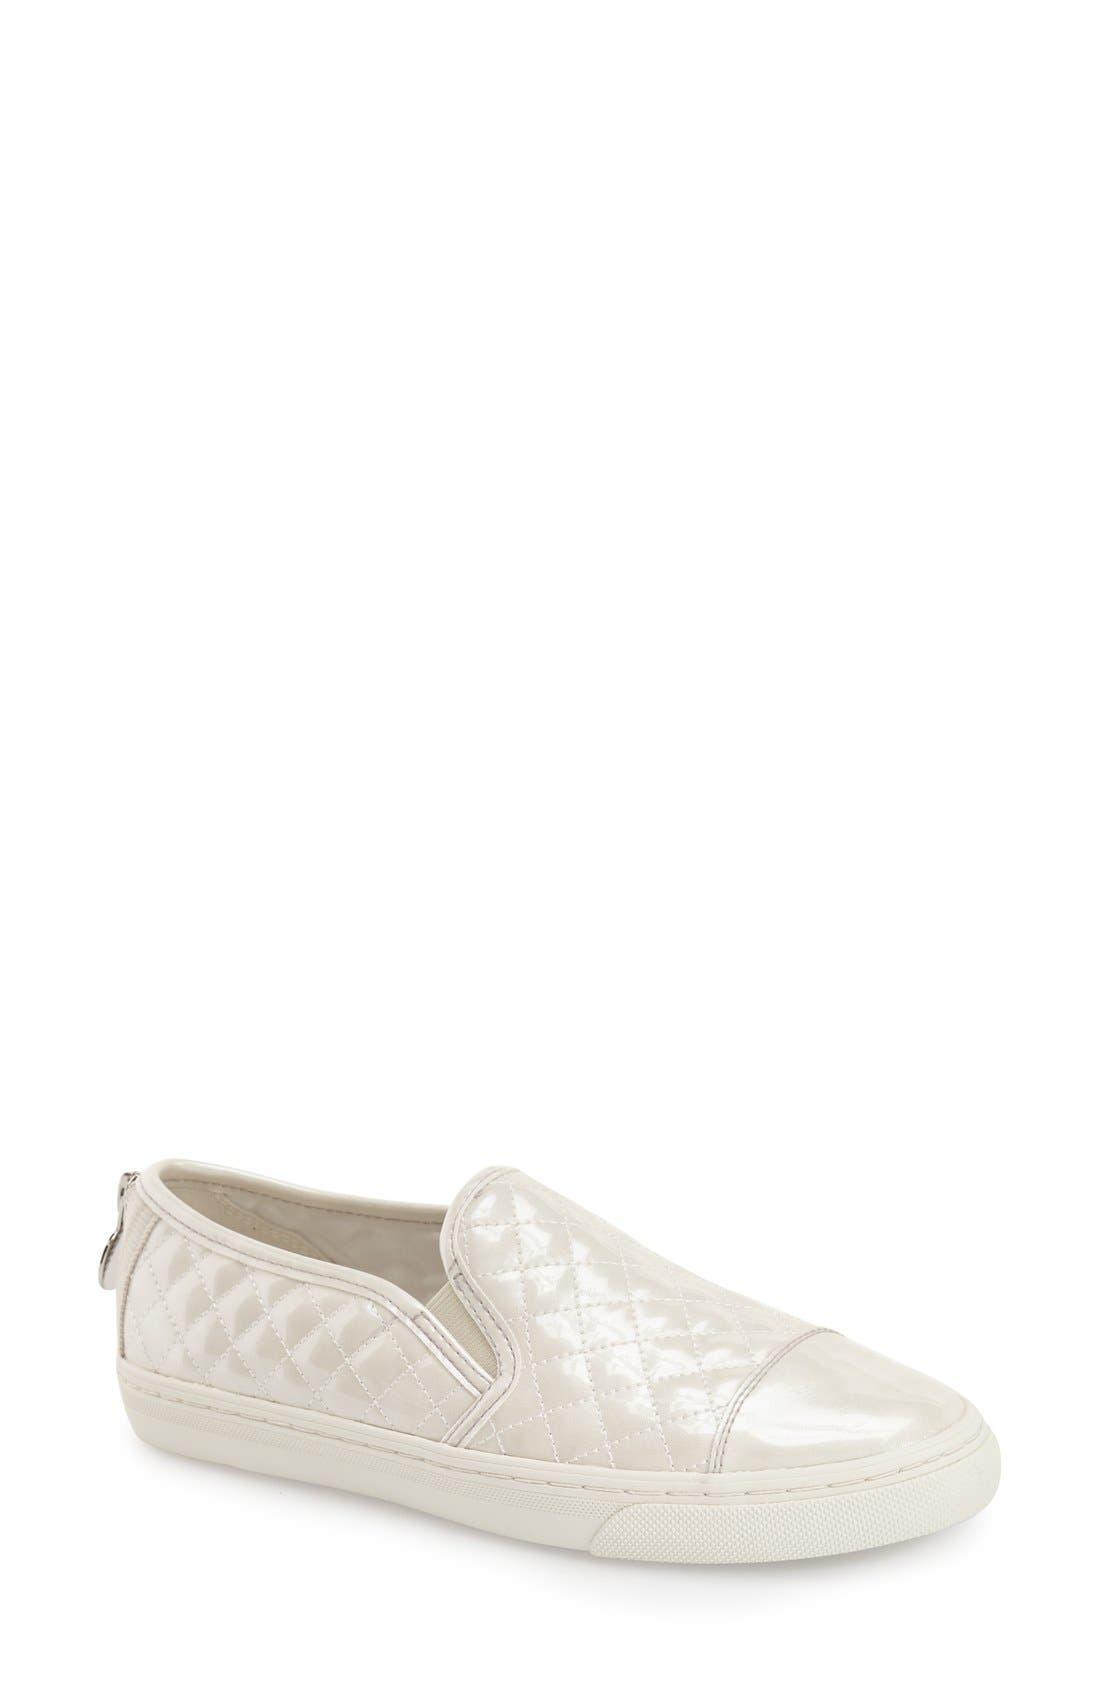 Alternate Image 1 Selected - Geox 'New Club' Slip-On Sneaker (Women)